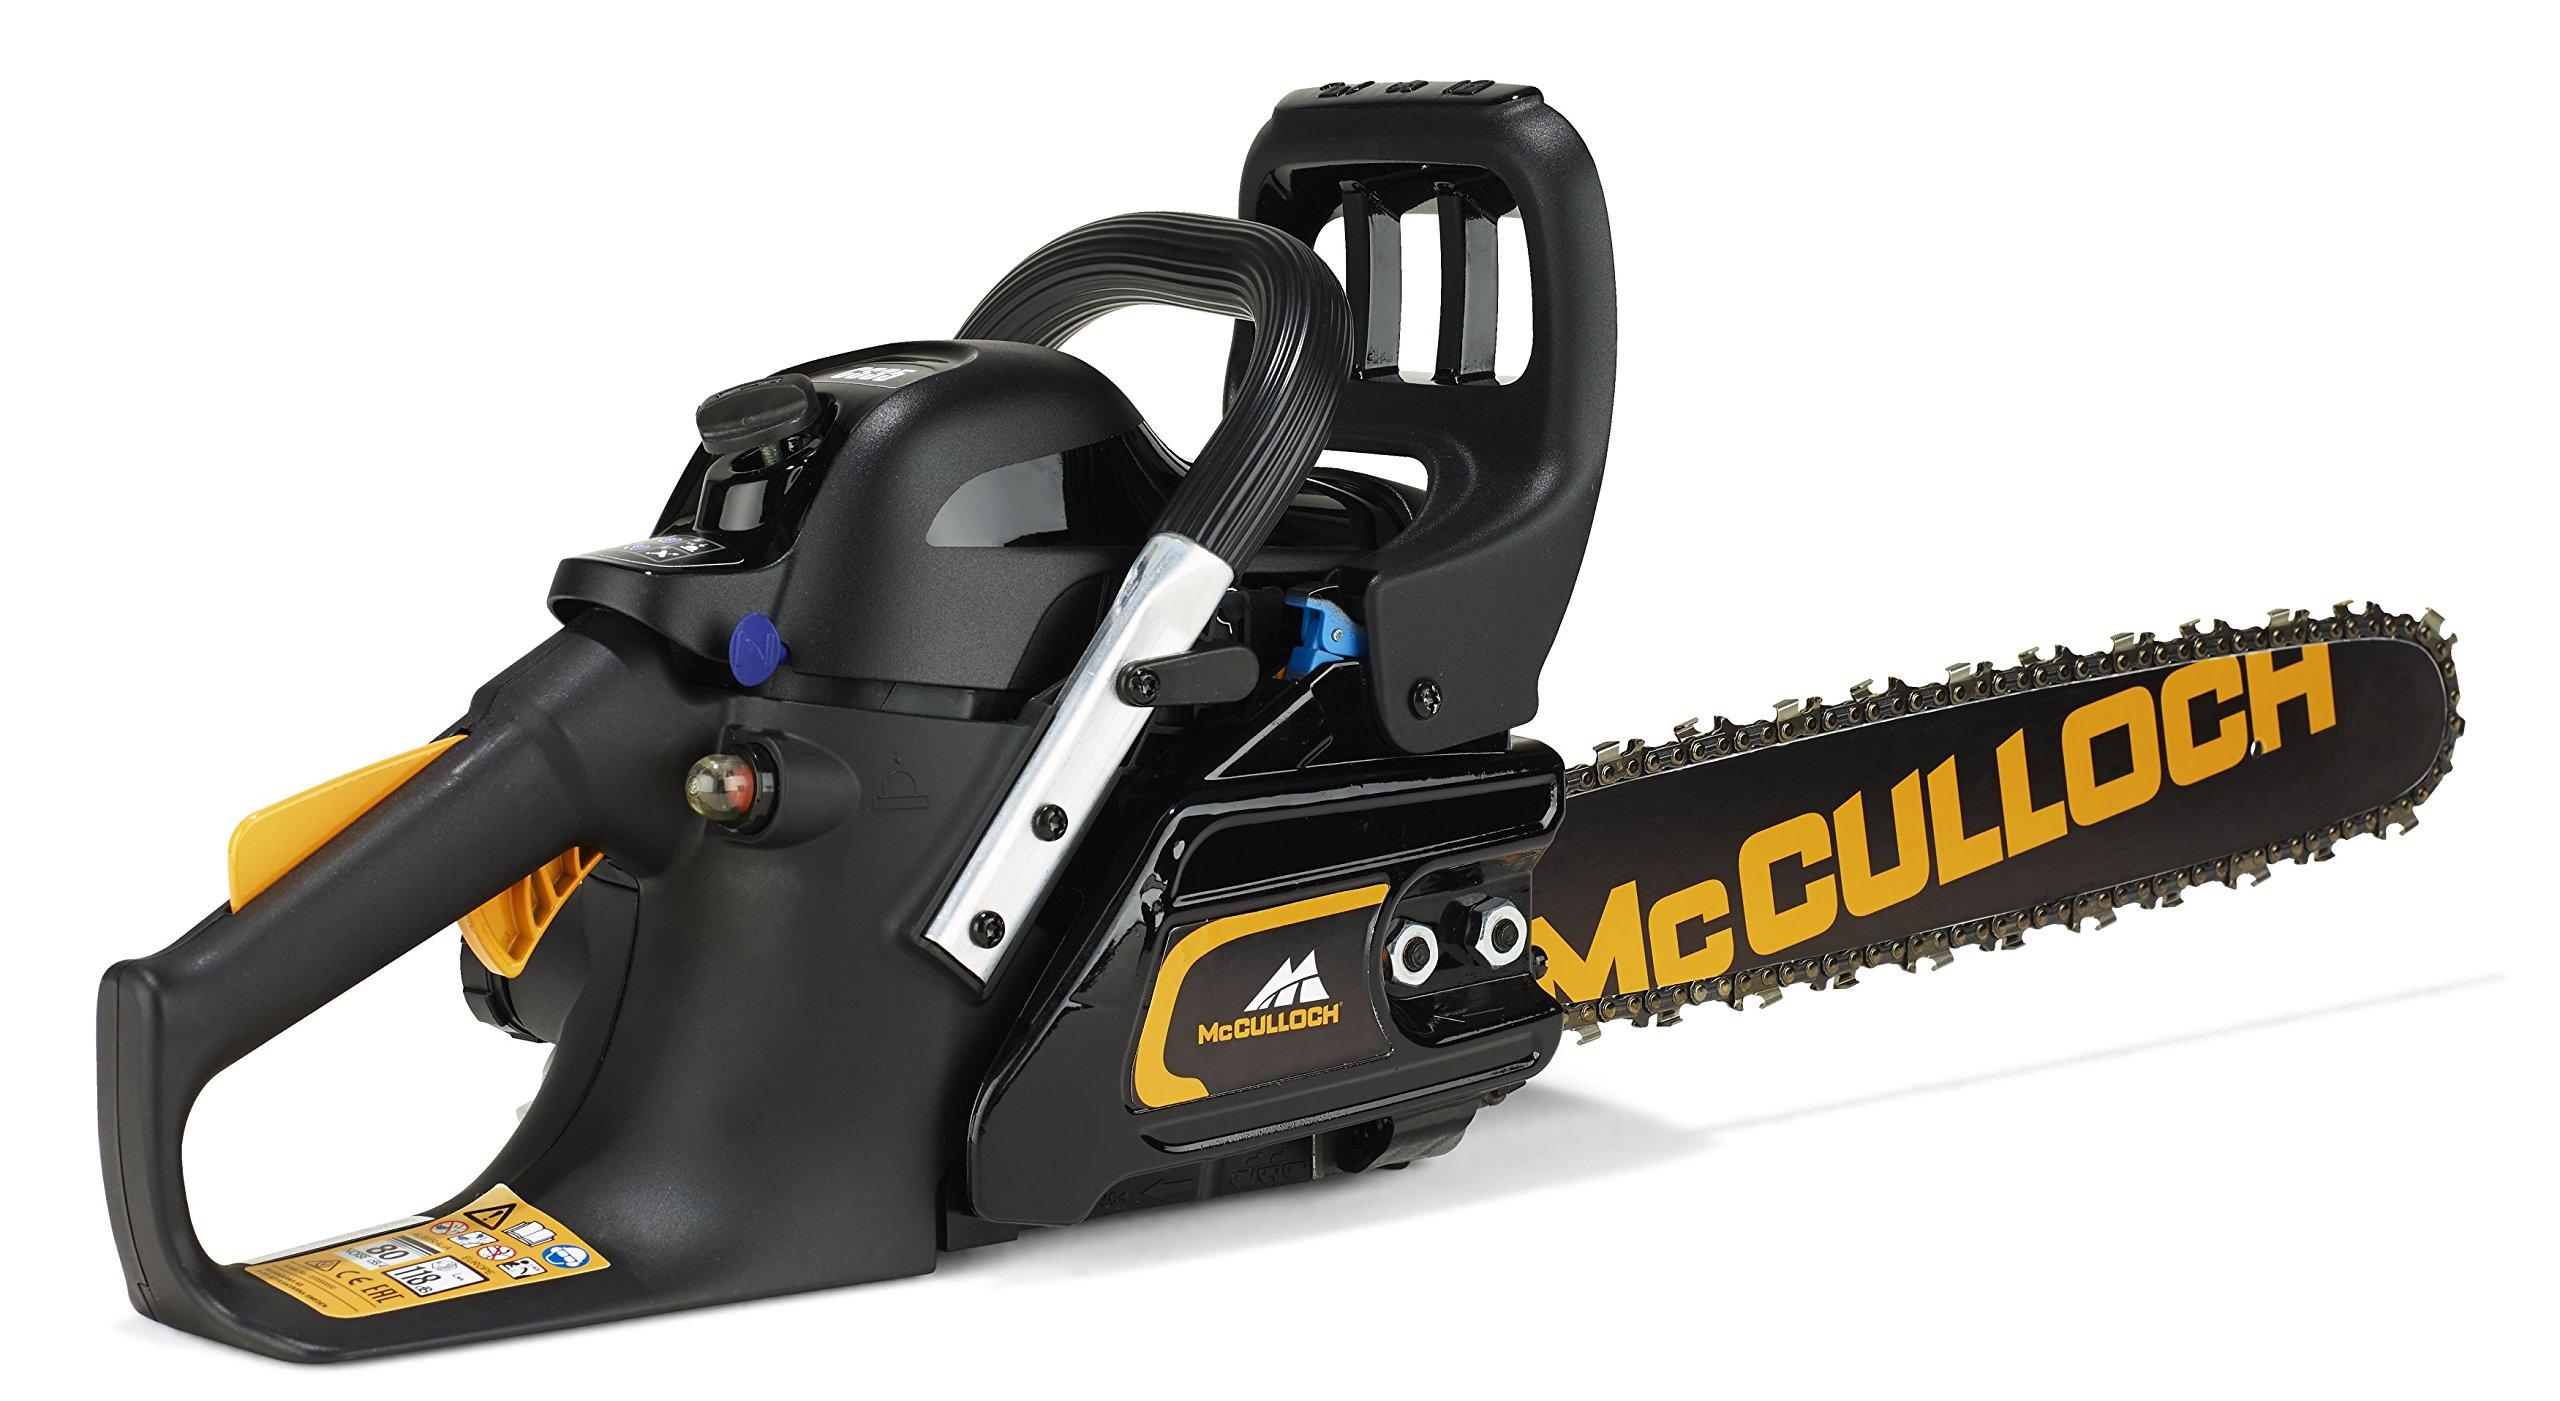 McCulloch-CS-35S-Easy-Start-35-cc-Benzin-Kettensge